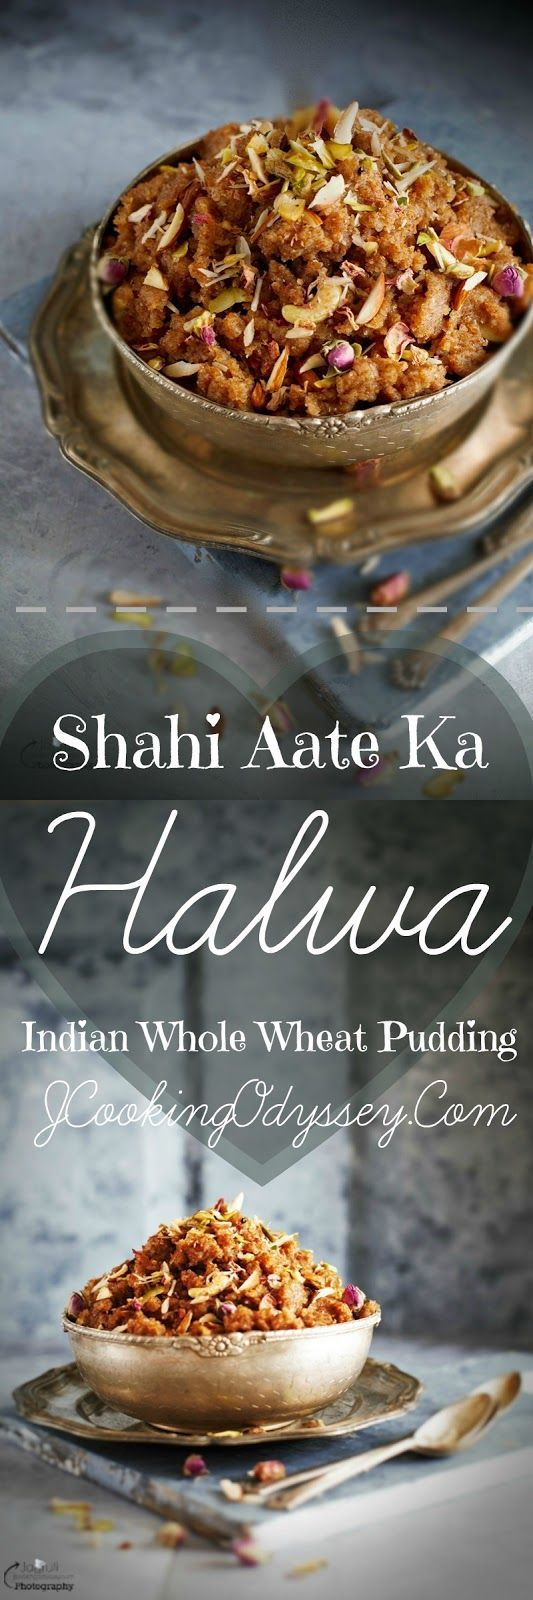 Jagruti's Cooking Odyssey: Shahi Aate / Atte Ka Halwa / Sheera - Indian Whole Wheat Pudding (scheduled via http://www.tailwindapp.com?utm_source=pinterest&utm_medium=twpin&utm_content=post113955461&utm_campaign=scheduler_attribution)